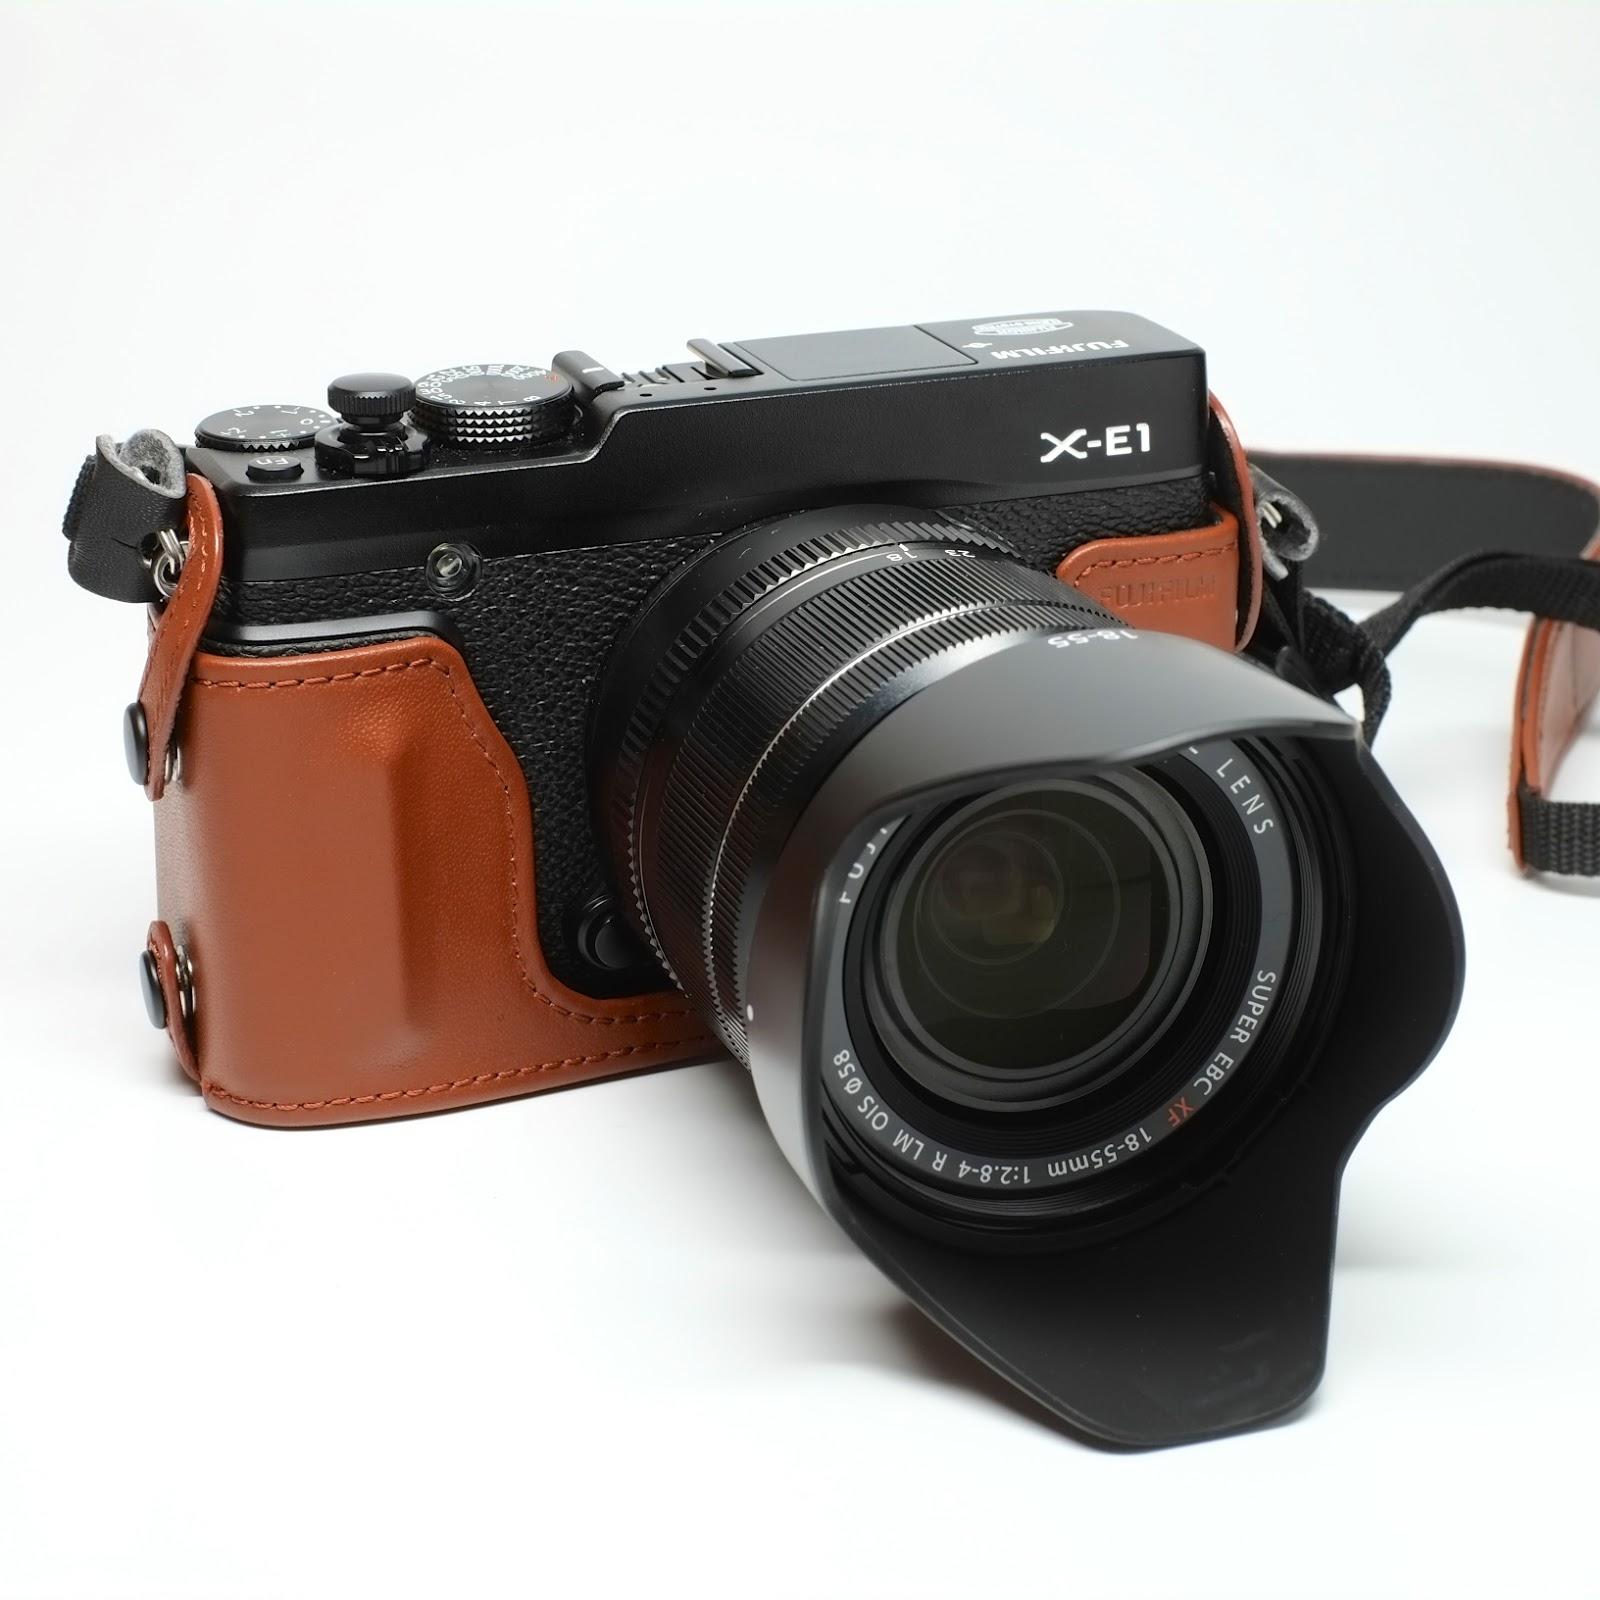 fujifilm x e1 leather half case xf14mm lens. Black Bedroom Furniture Sets. Home Design Ideas